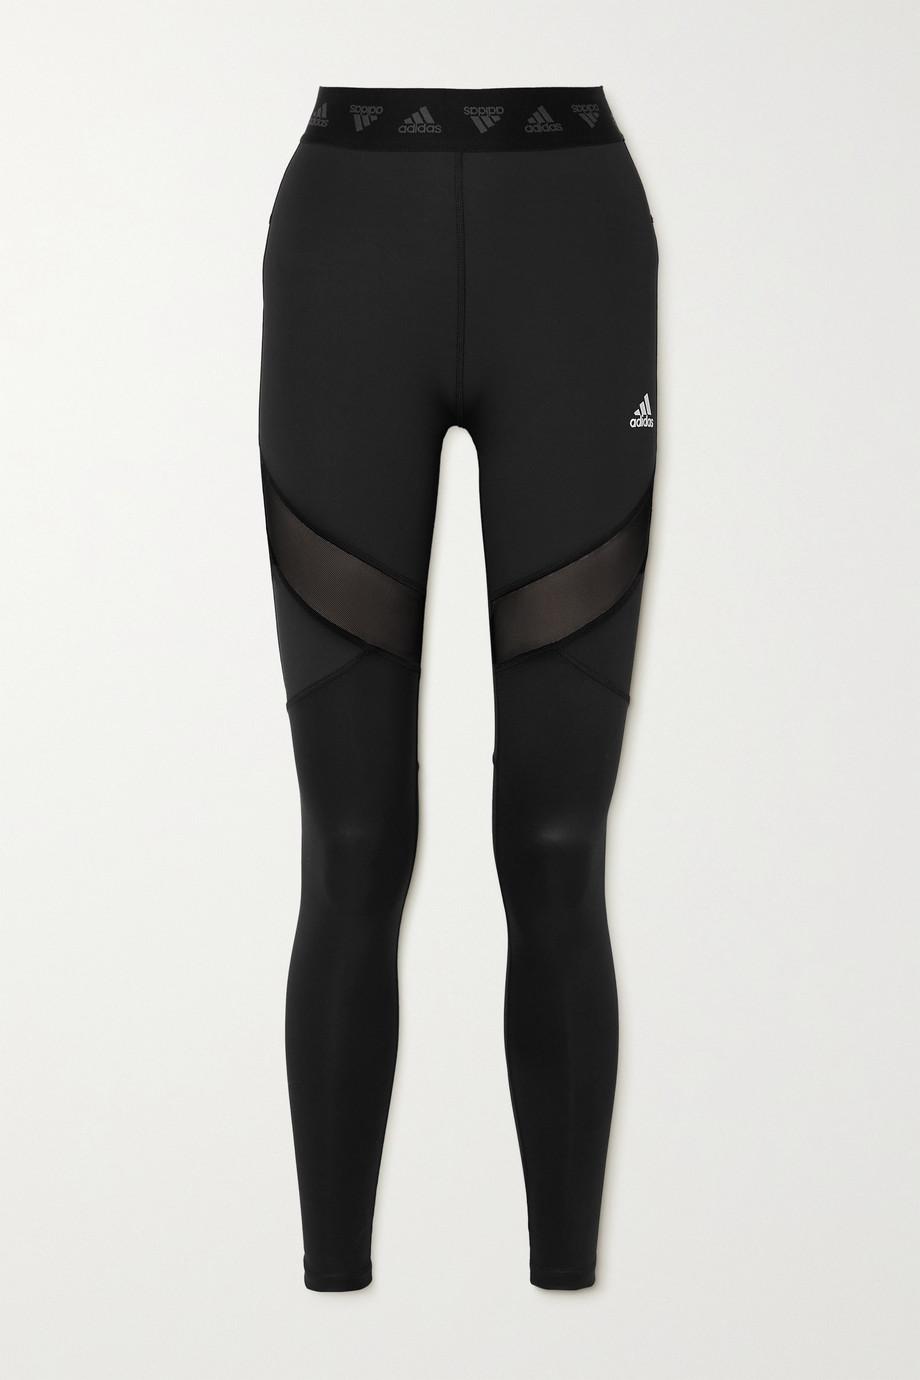 adidas Originals Hyperglam mesh-paneled recycled stretch leggings